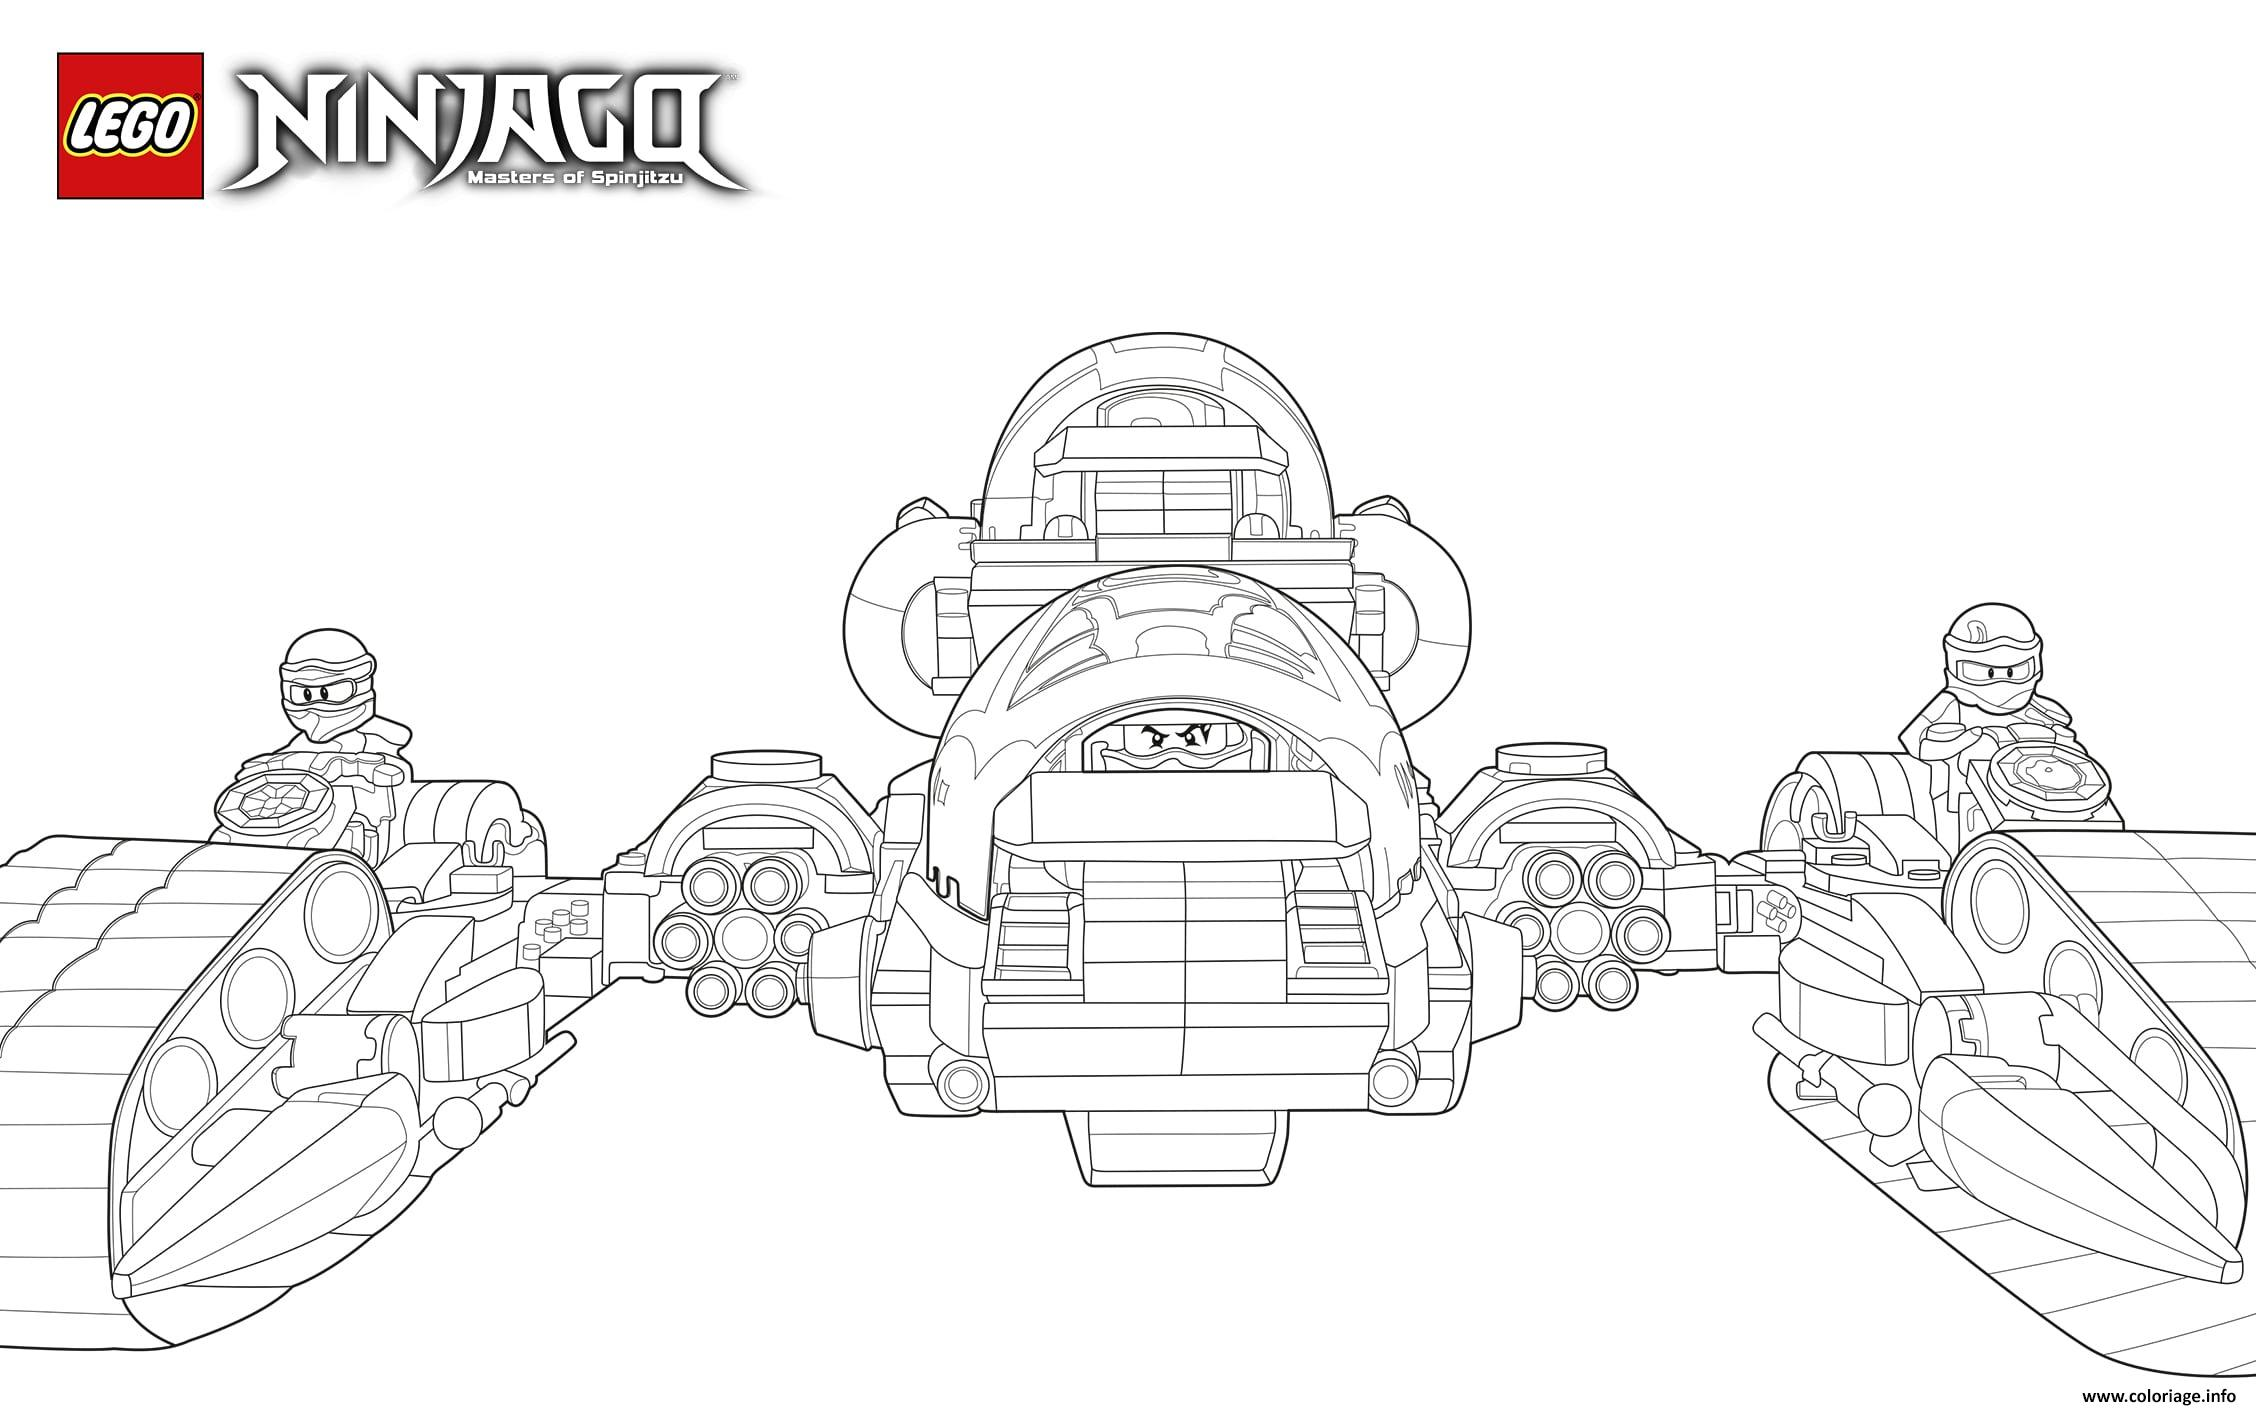 coloriage lego ninjago ninjaja nouvelle saison dessin imprimer - Lego Ninjago Nouvelle Saison